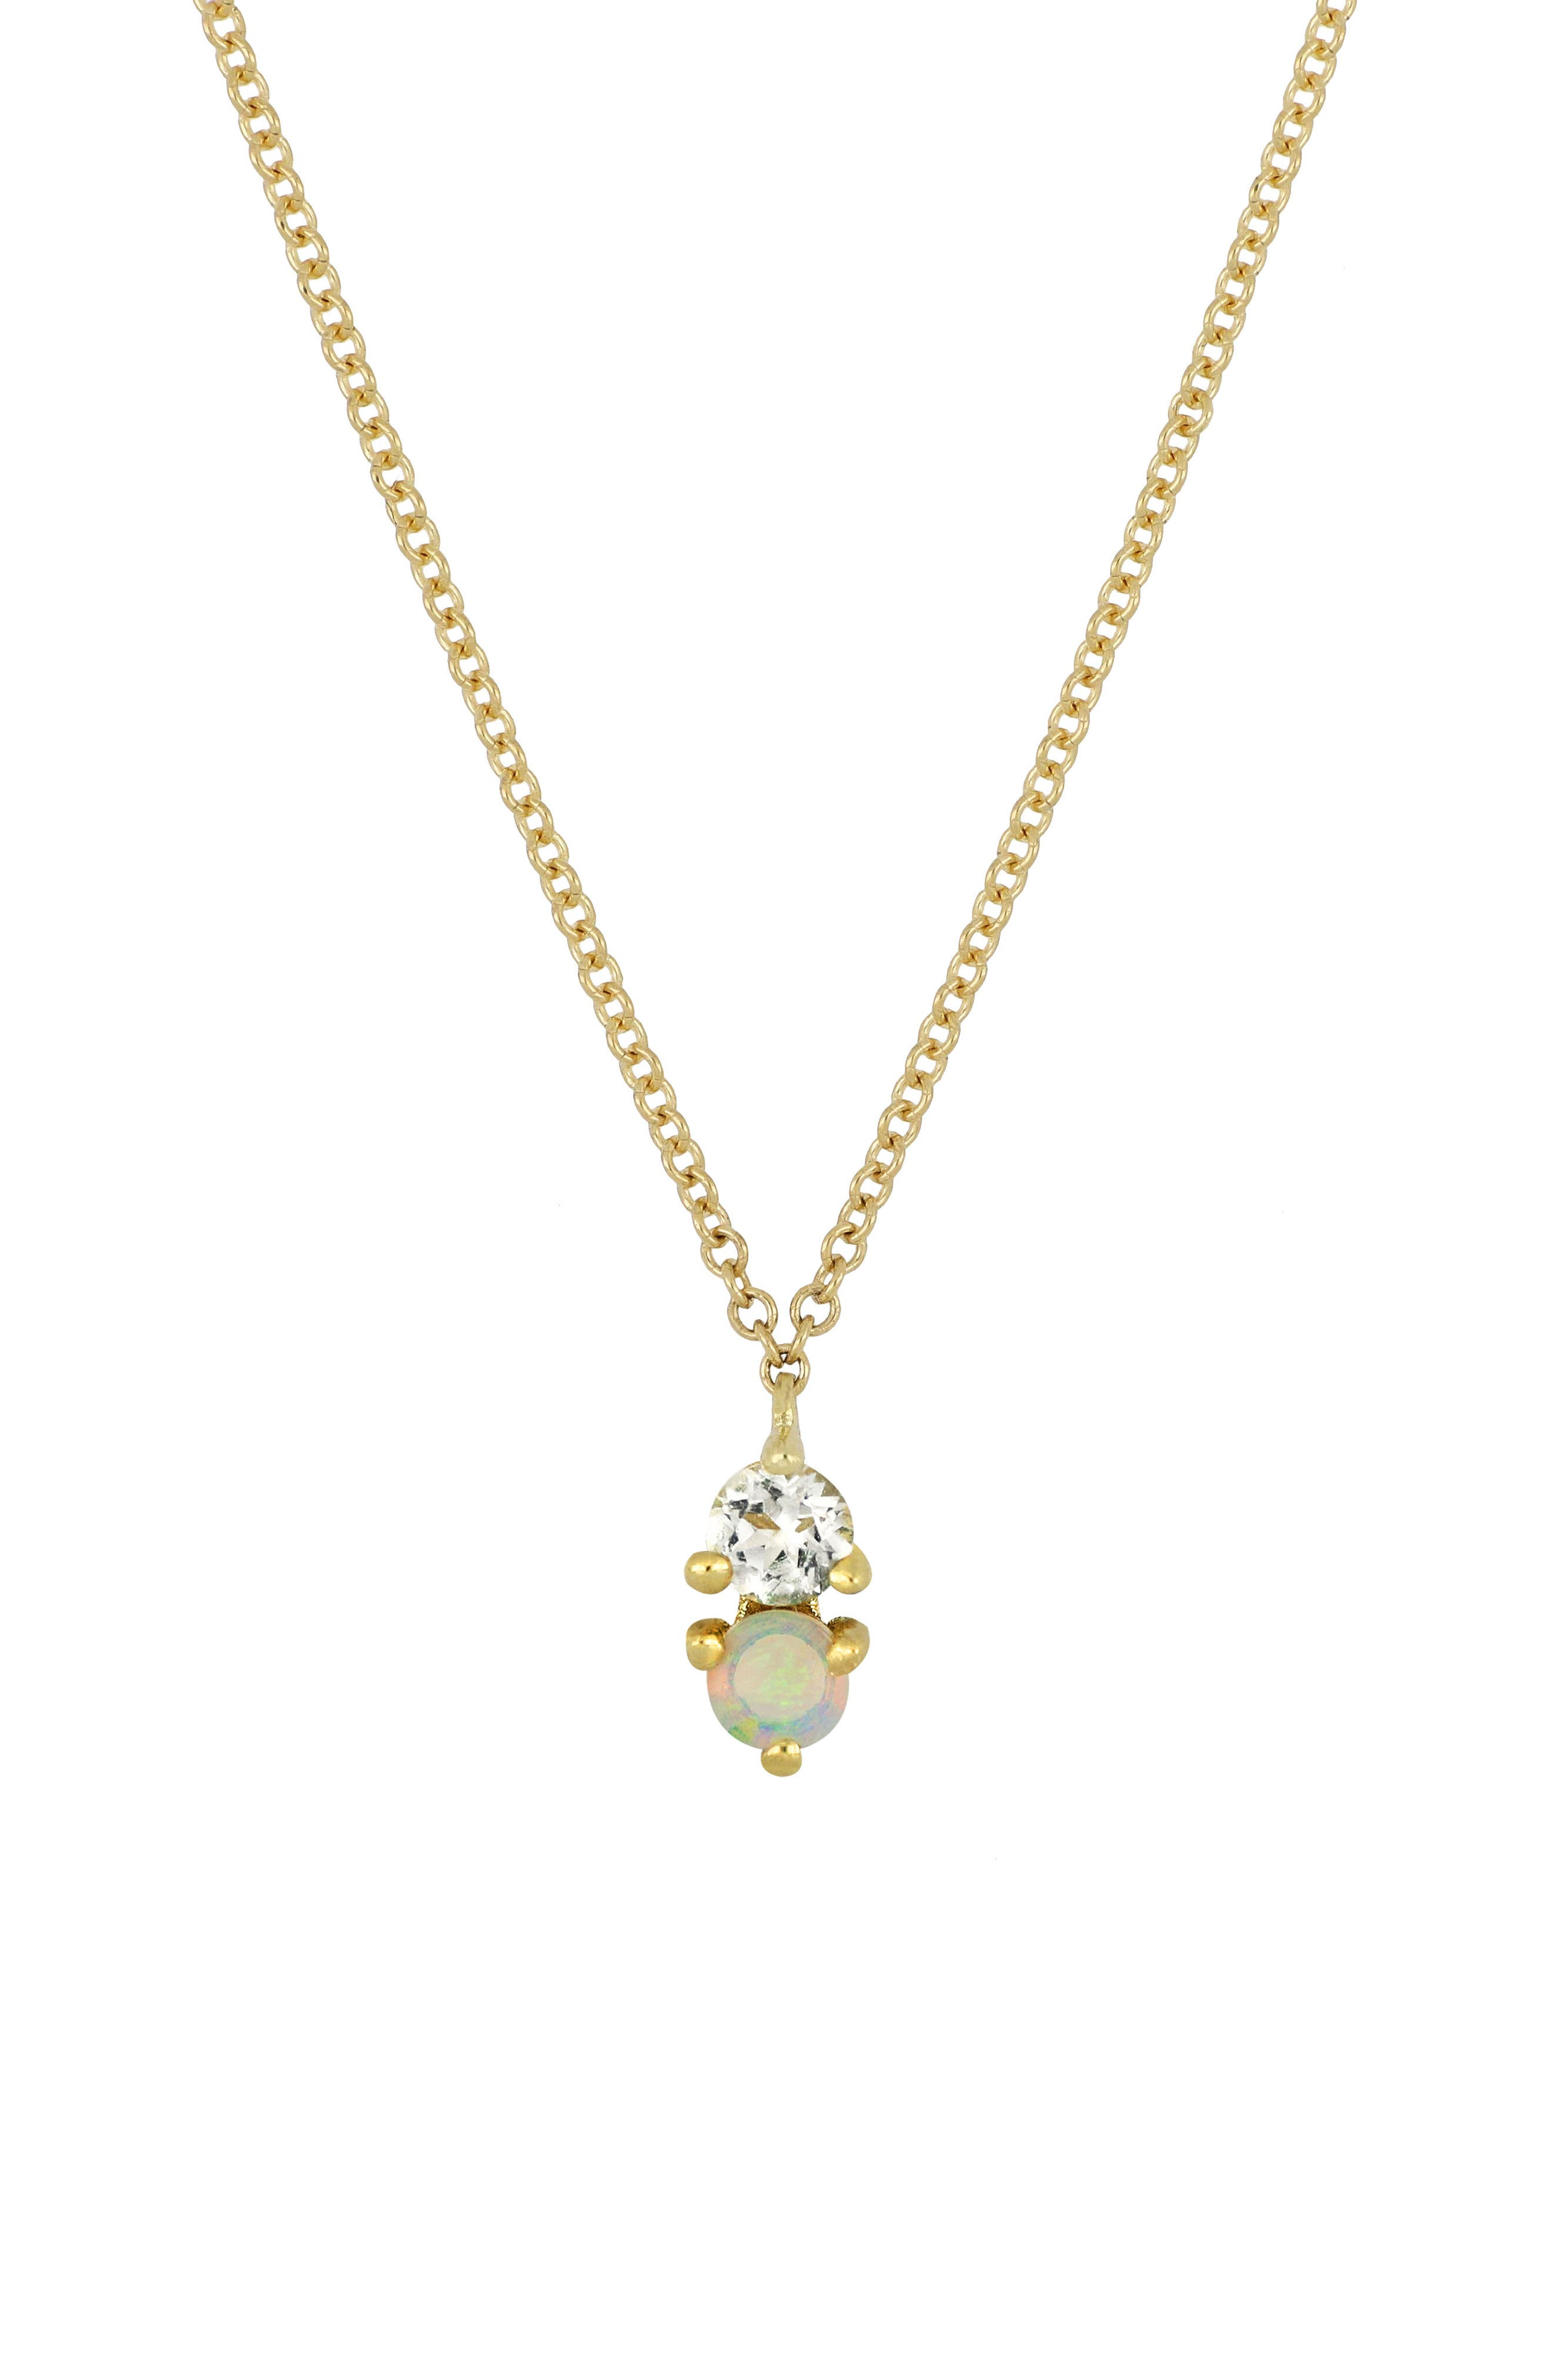 Birthstone Pendant Necklace (Nordstrom Exclusive)